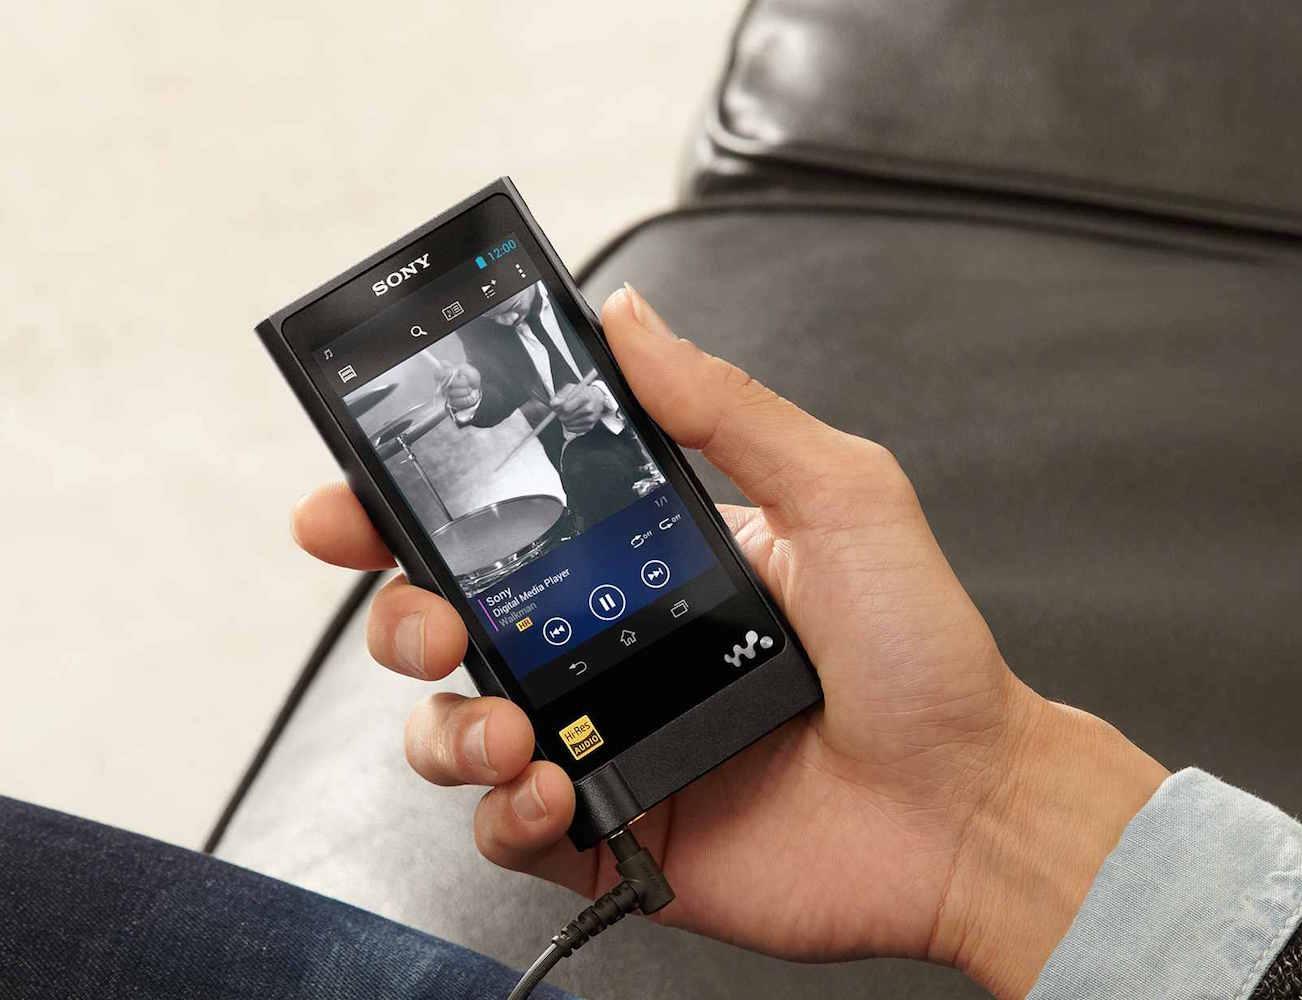 ZX2+High+Resolution+Walkman+From+Sony